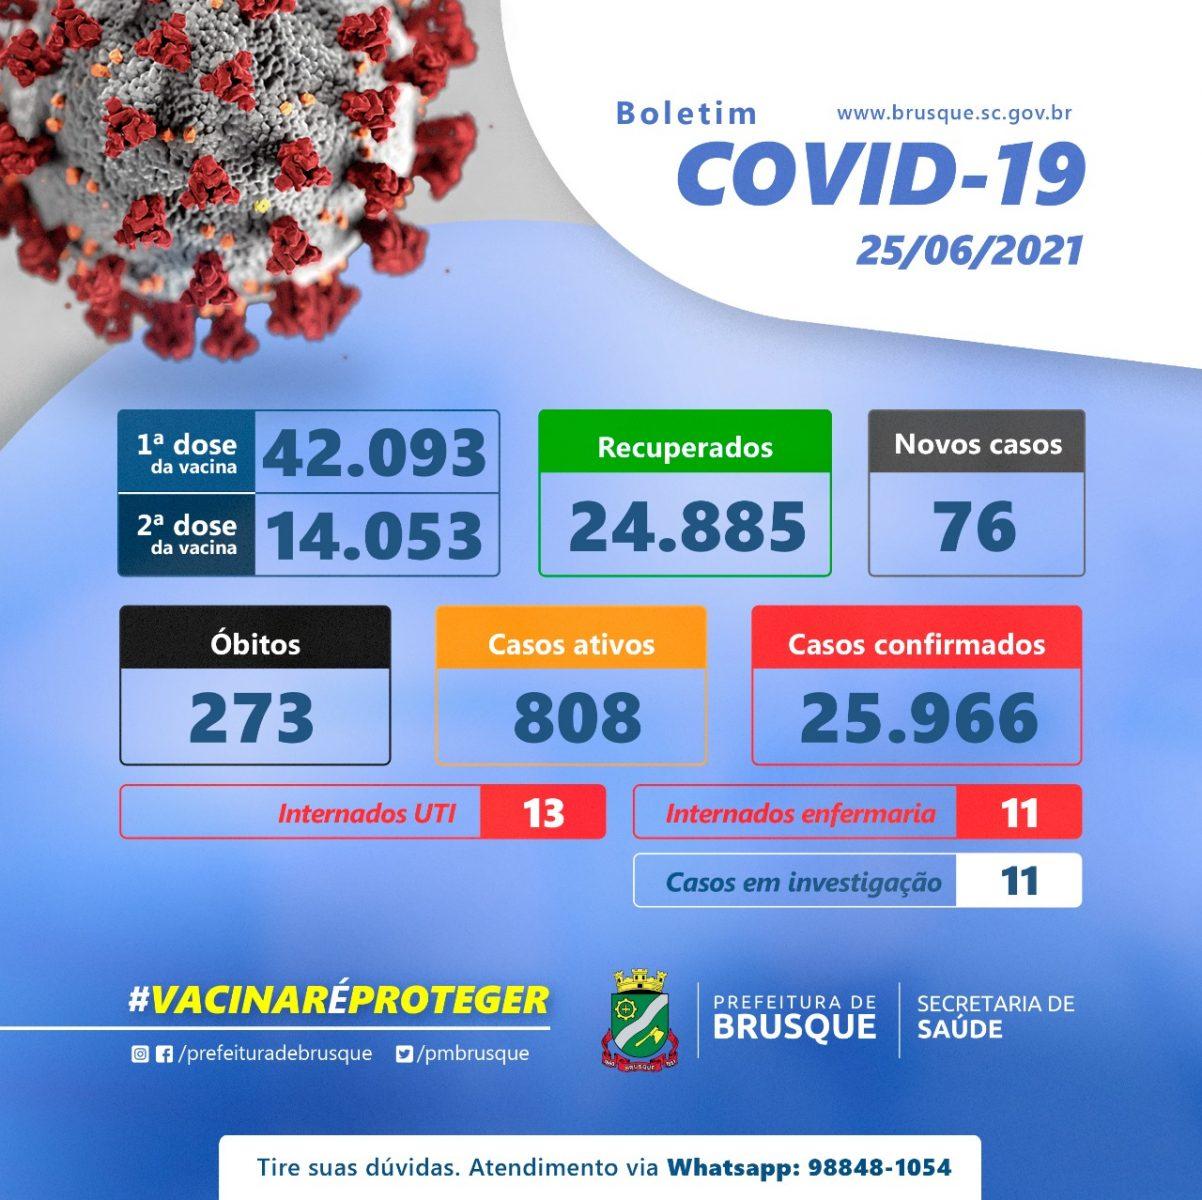 Covid-19: Confira o boletim epidemiológico desta sexta-feira (25)